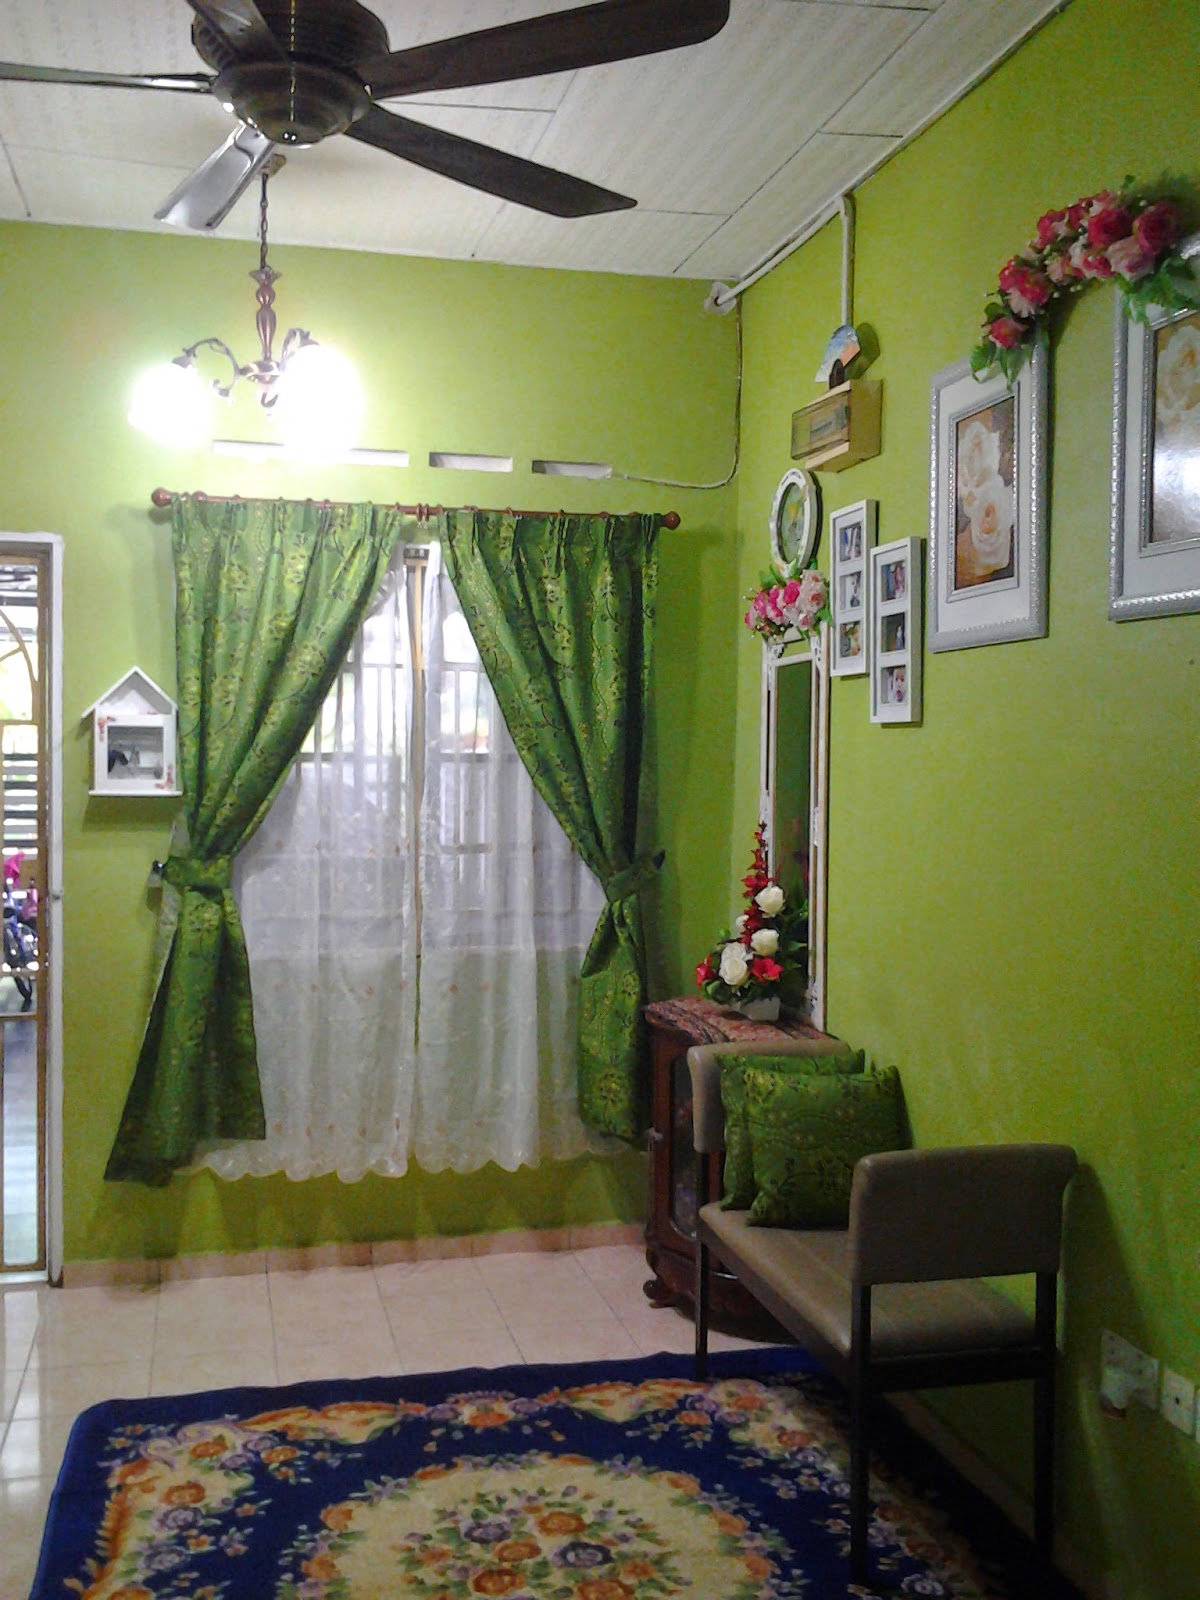 Contoh Ruang Tamu Cat Hijau Desain Interior Mungil 1 Home Decorations Gambar